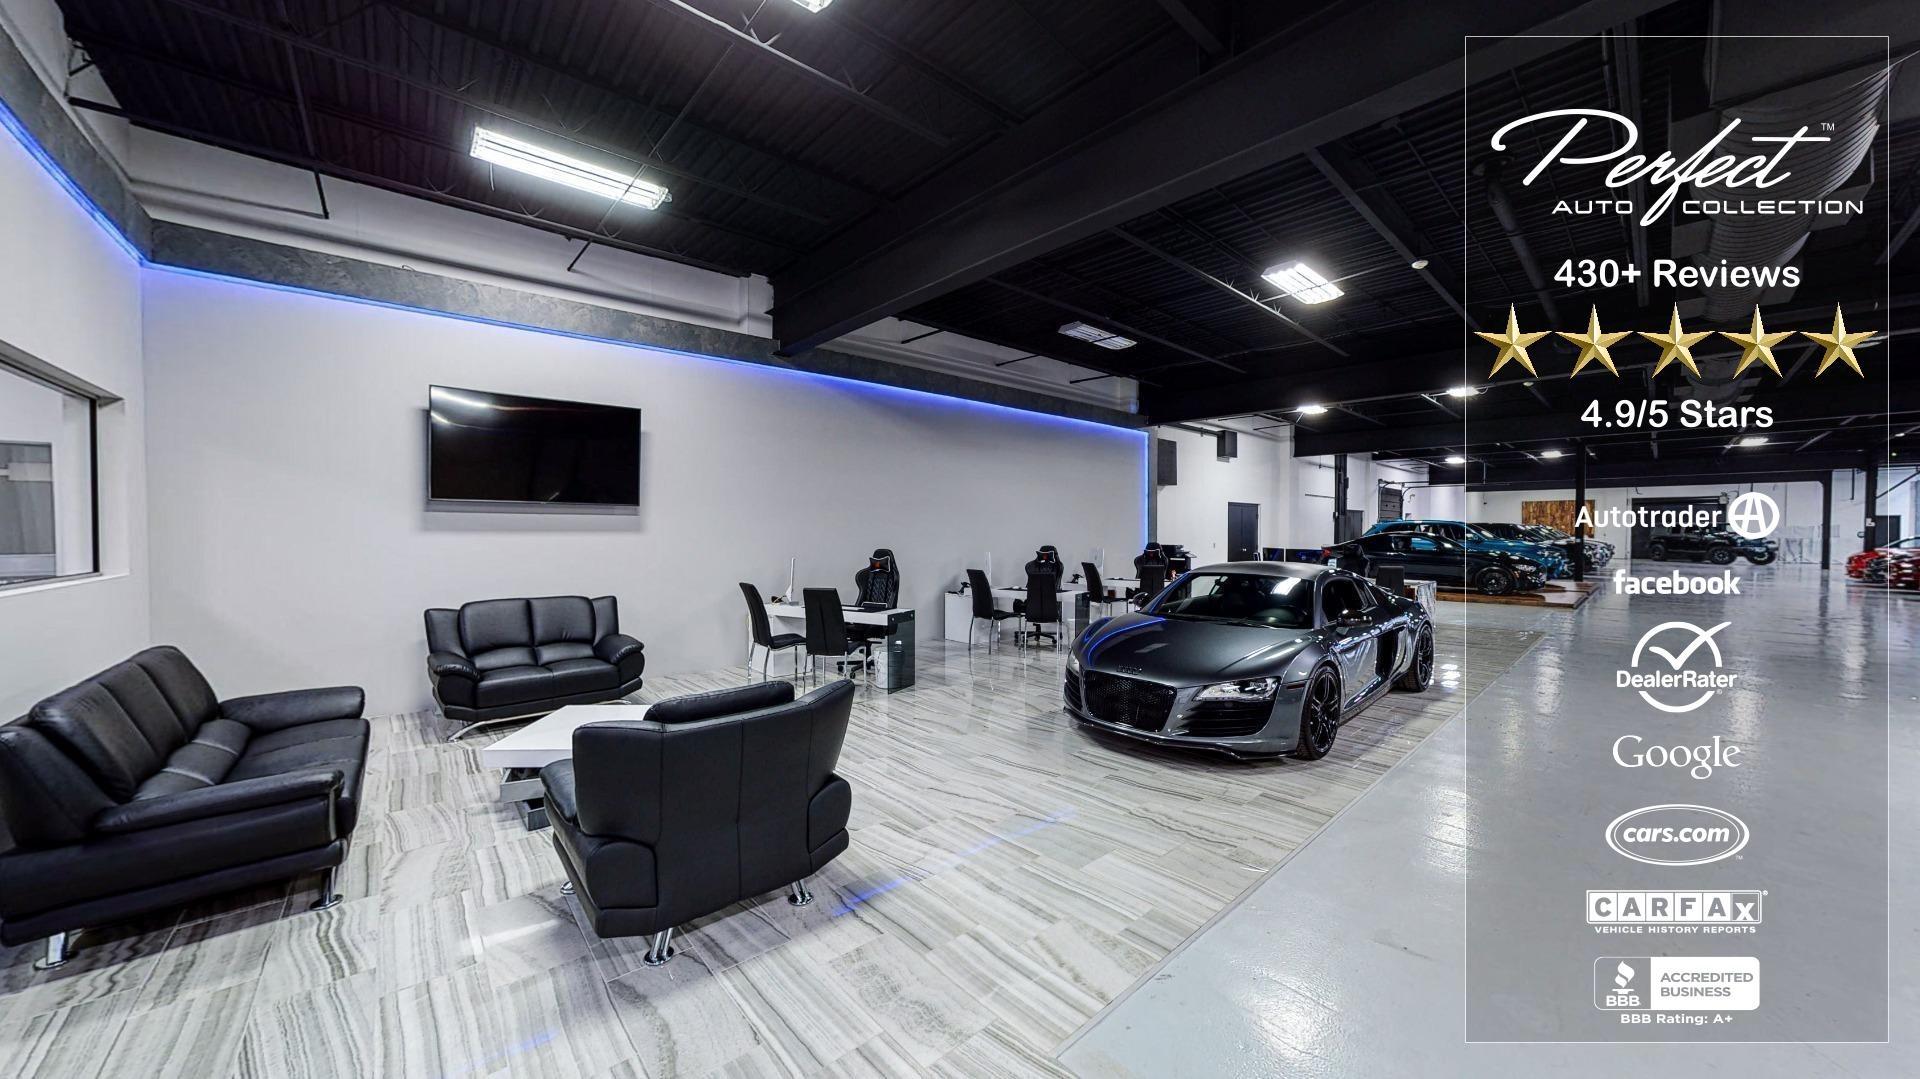 Used 2018 Audi Q5 2.0T quattro Premium Plus for sale $30,995 at Perfect Auto Collection in Akron OH 44310 2